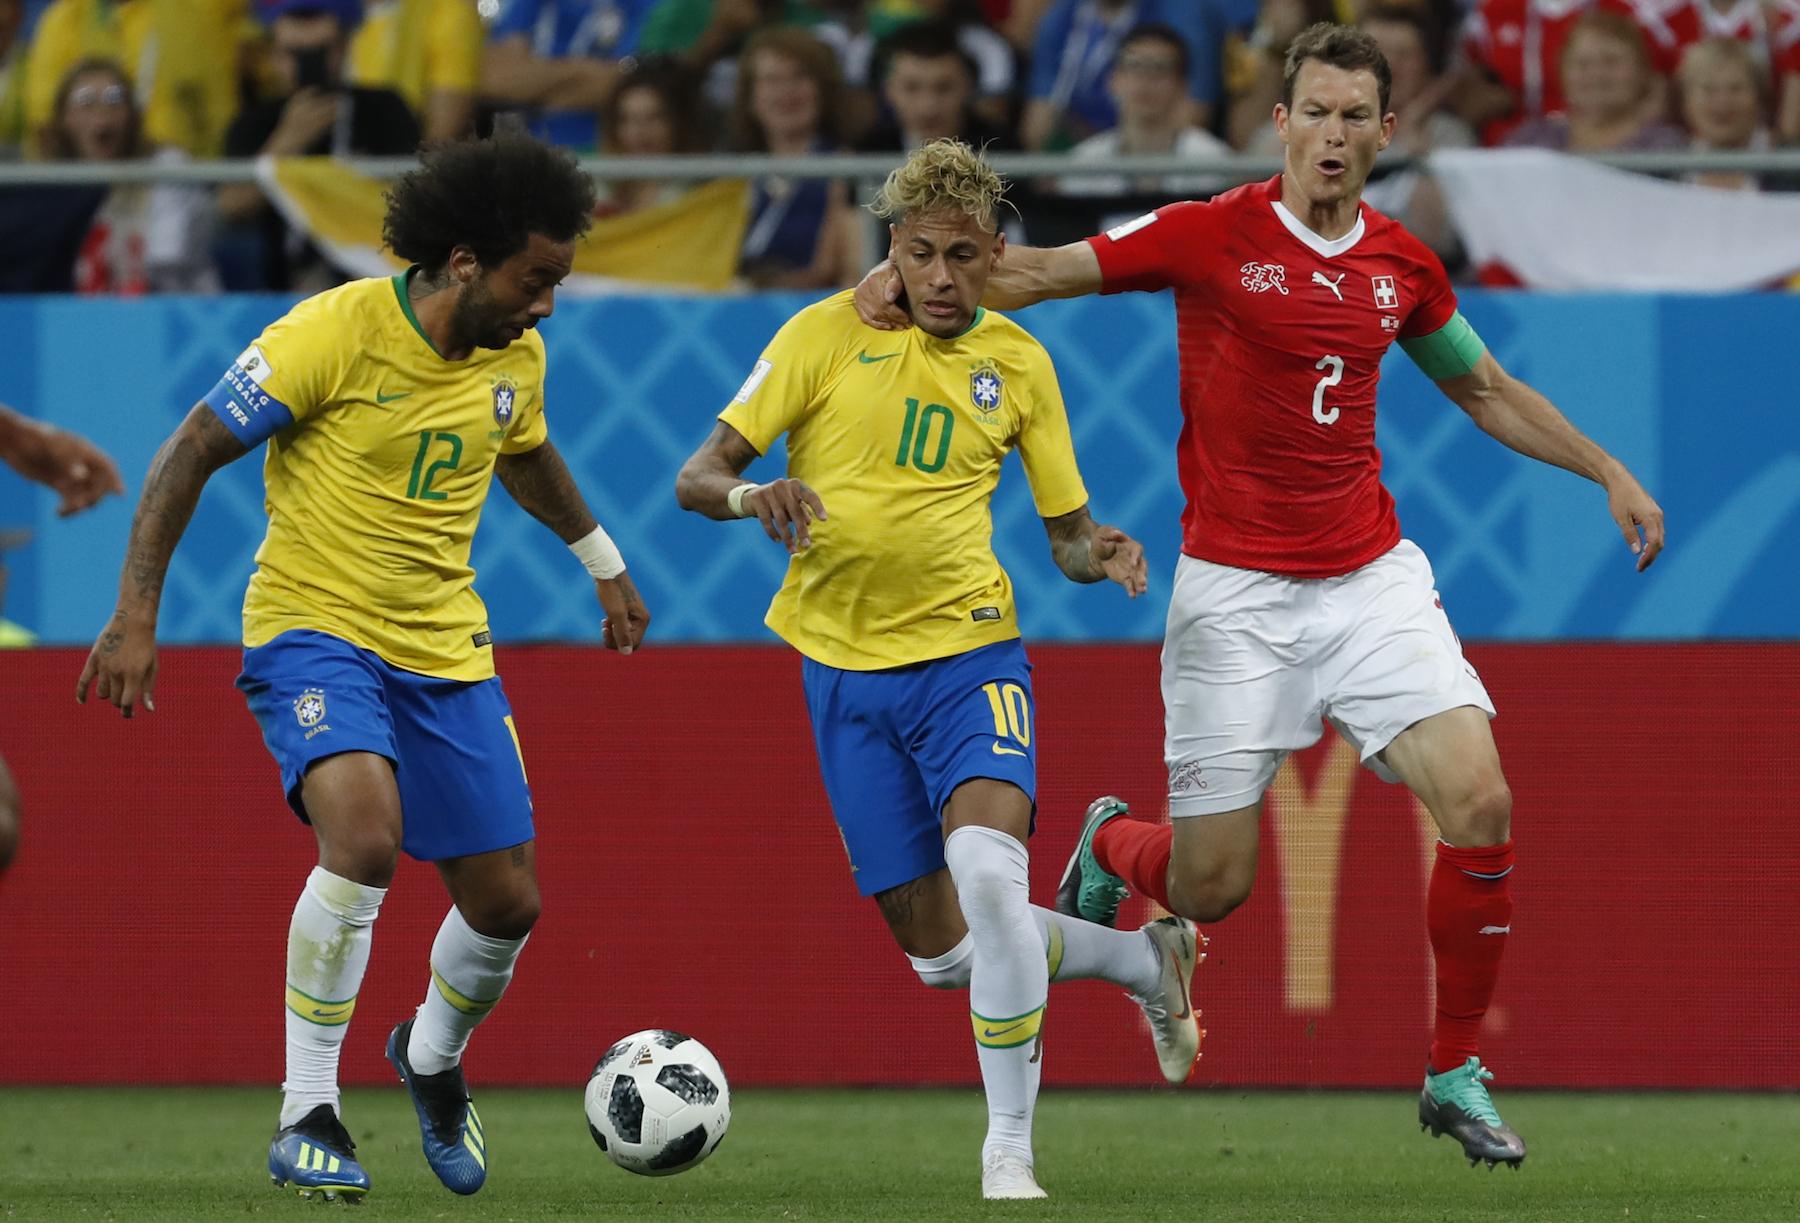 <div class='meta'><div class='origin-logo' data-origin='AP'></div><span class='caption-text' data-credit='AP Photo/Darko Vojinovic'>Brazil's Neymar, center, duels for the ball with Switzerland's Stephan Lichtsteiner, right, during the group E match between Brazil and Switzerland at the 2018 soccer World Cup.</span></div>